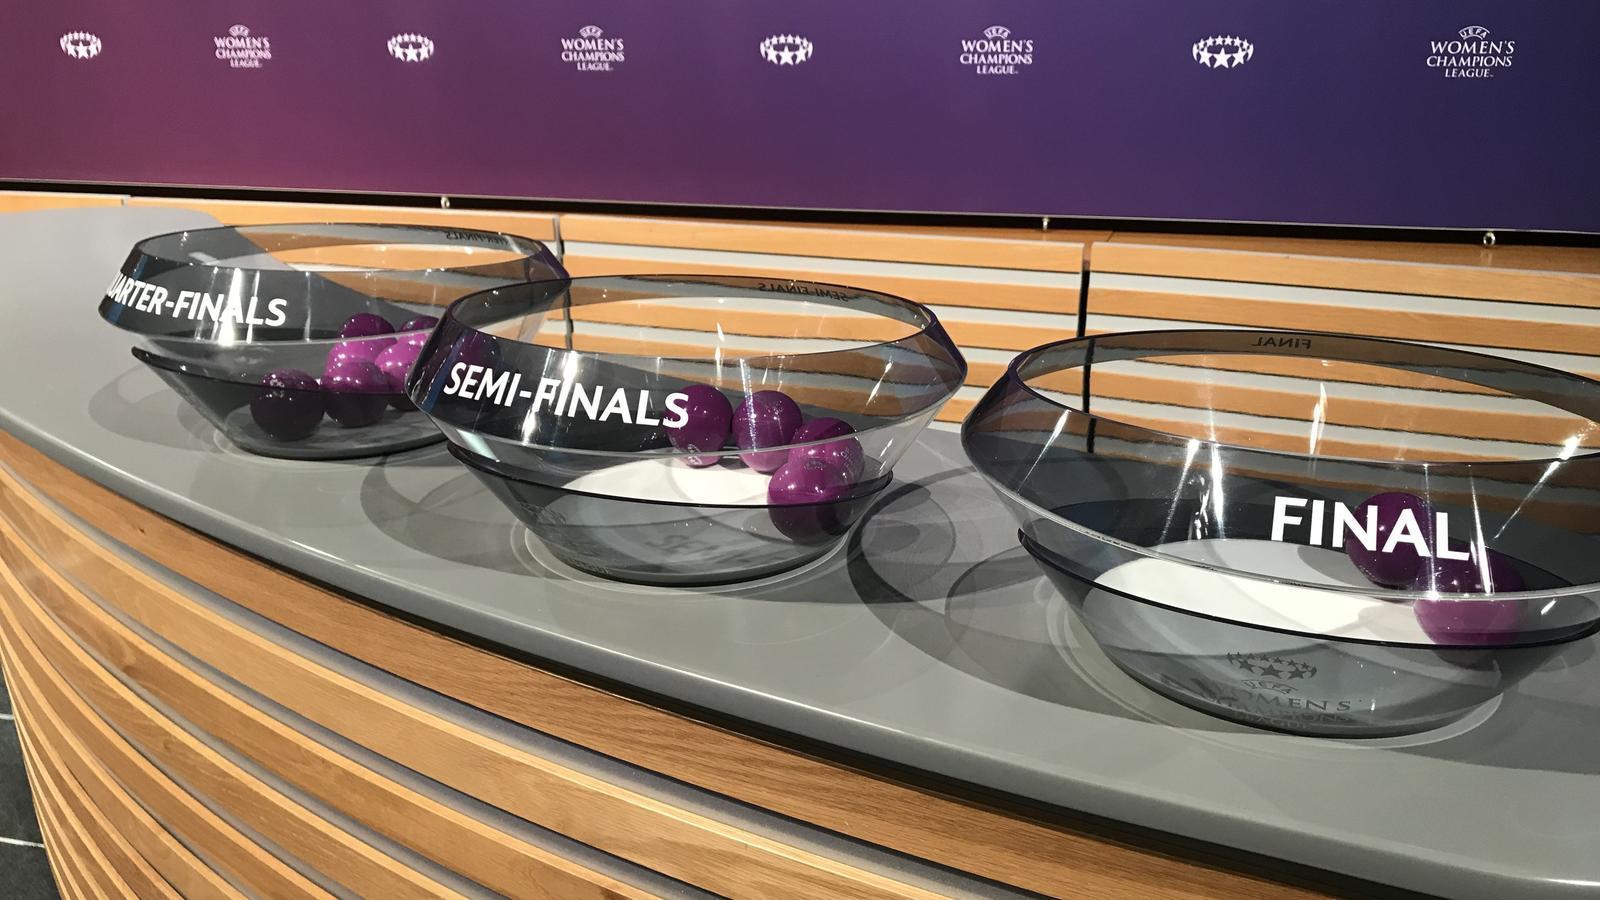 Sorteig de la Champions femenina